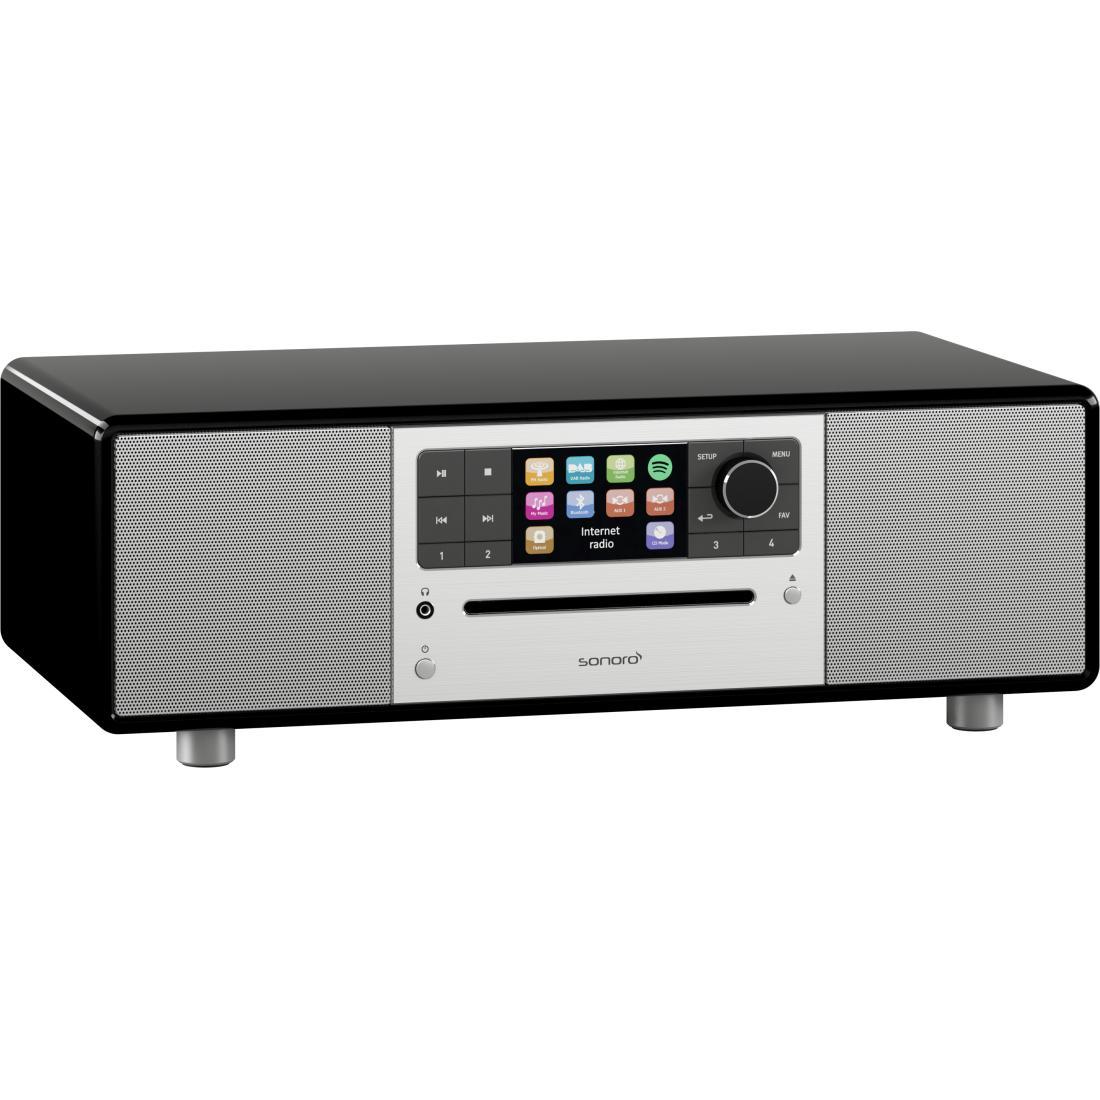 sonoro Prestige Audiosystem schwarz